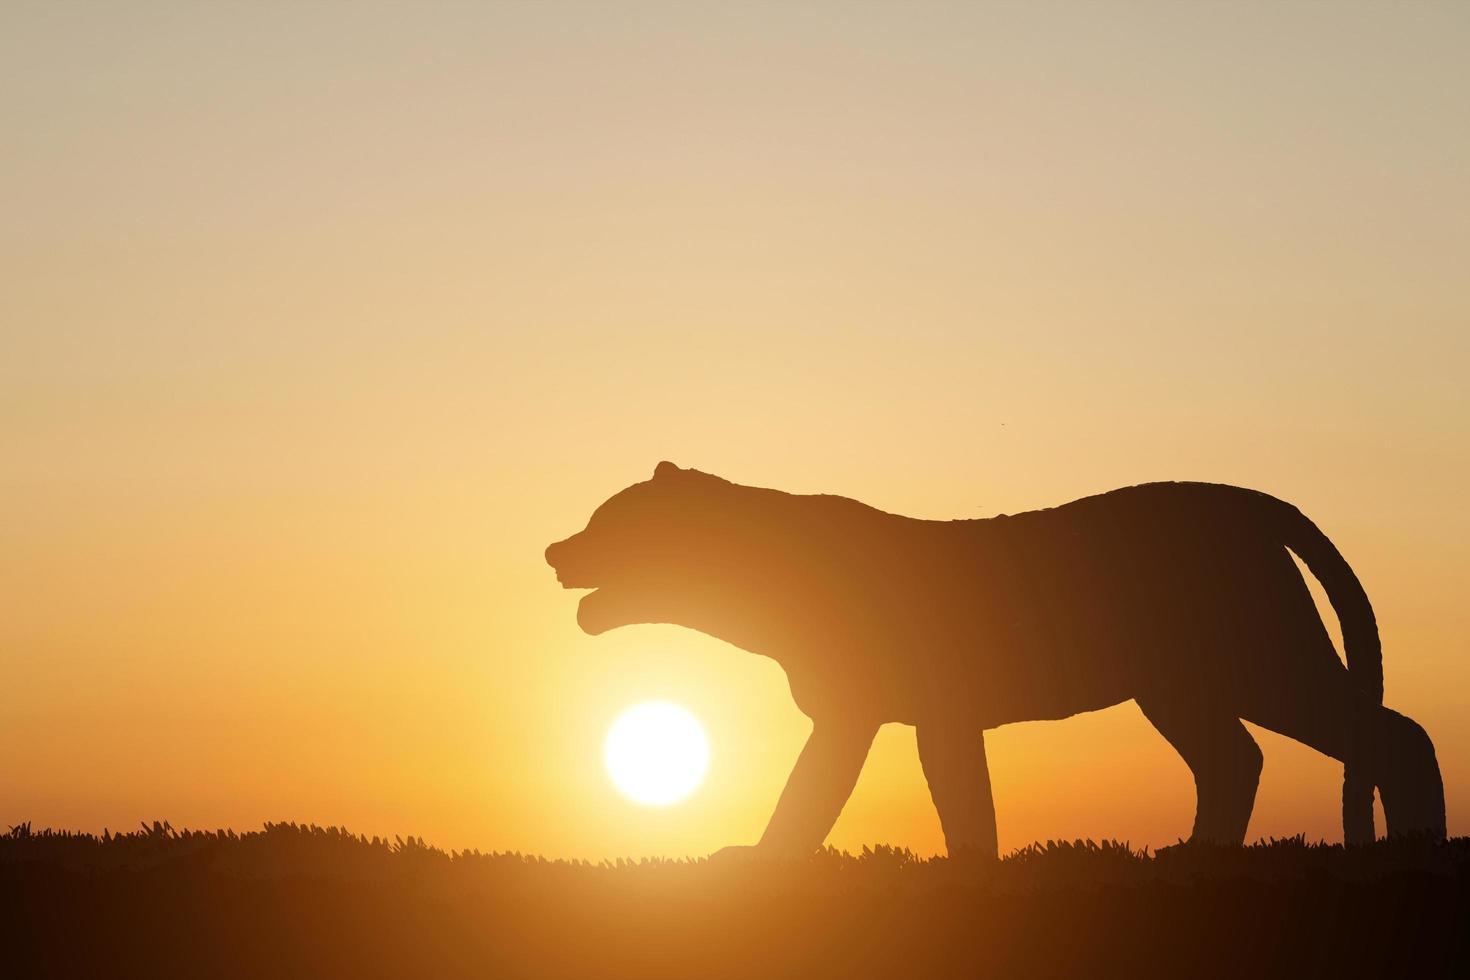 silhouet tijger op zonsondergang achtergrond foto